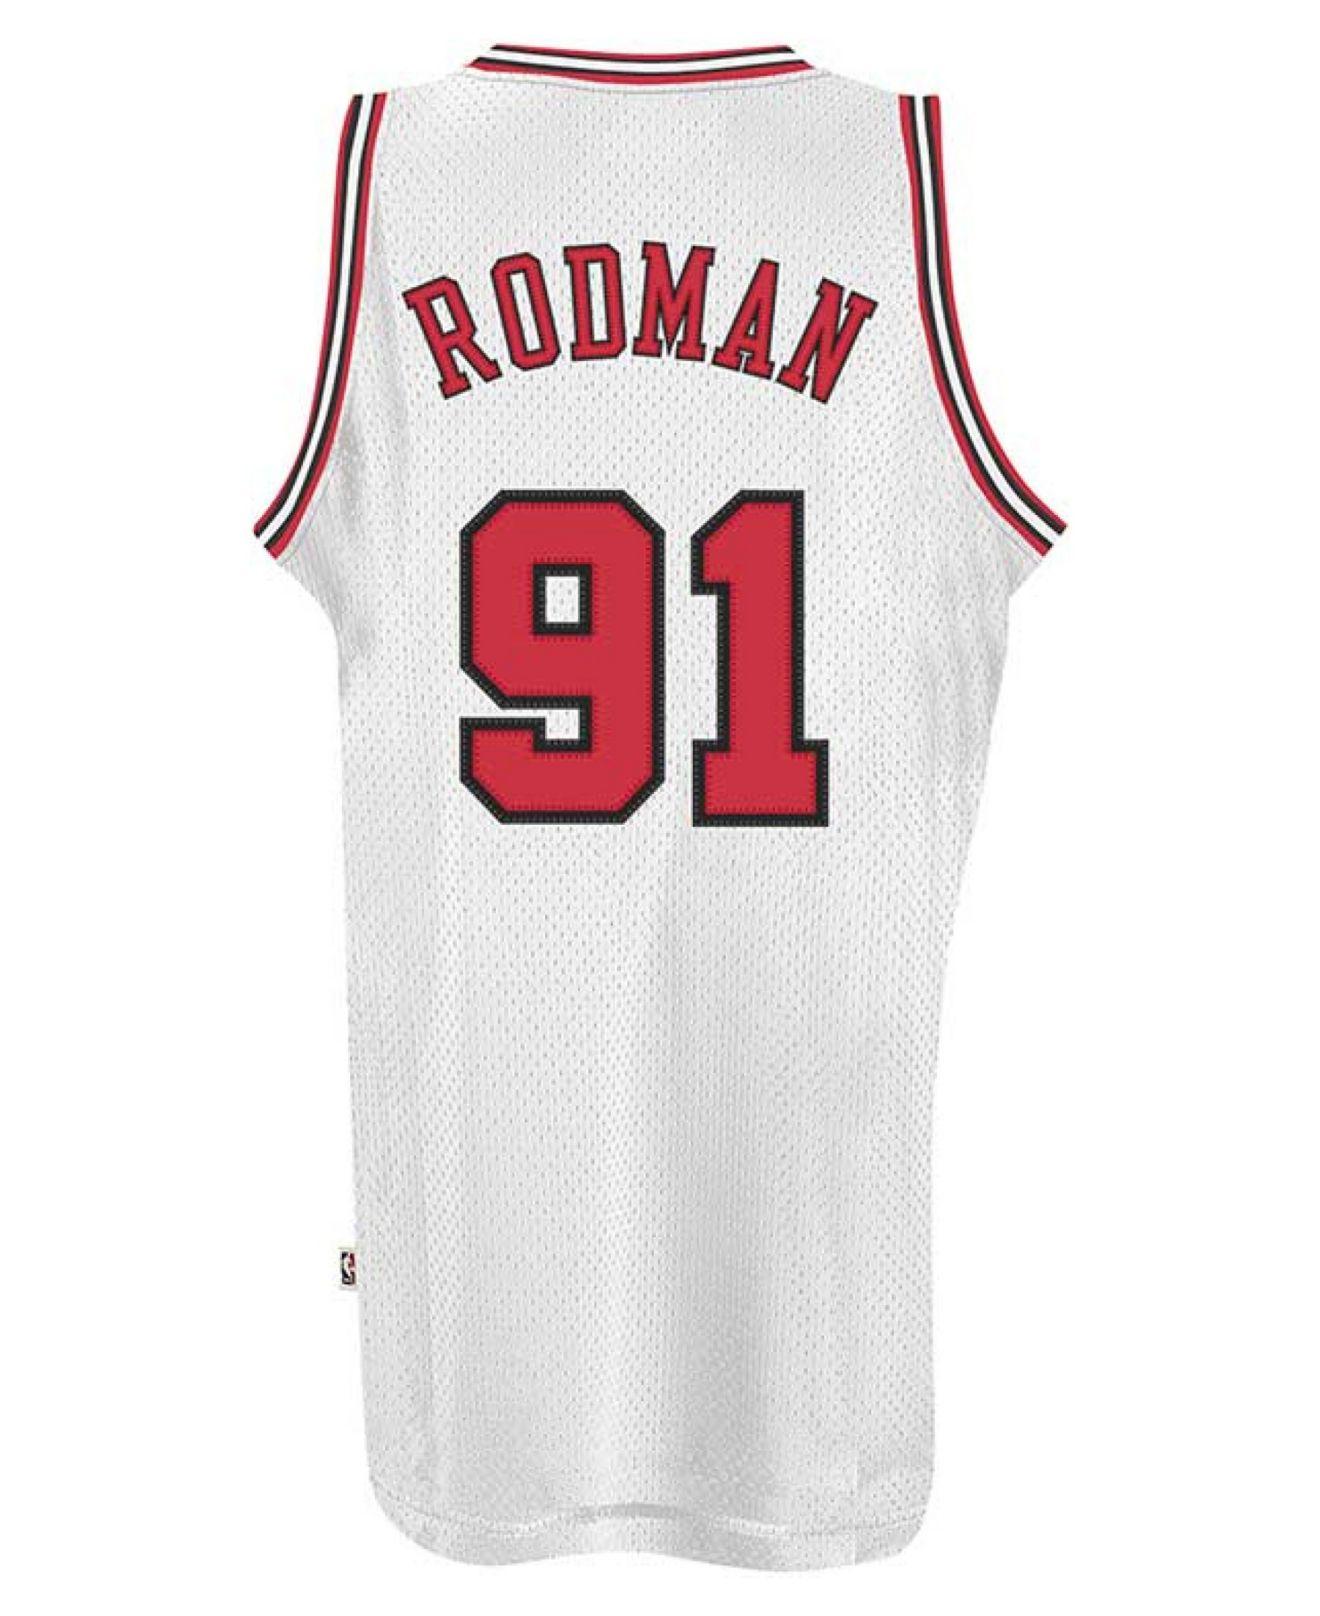 timeless design dd4be ae215 Lyst - adidas Men'S Dennis Rodman Chicago Bulls Retired ...